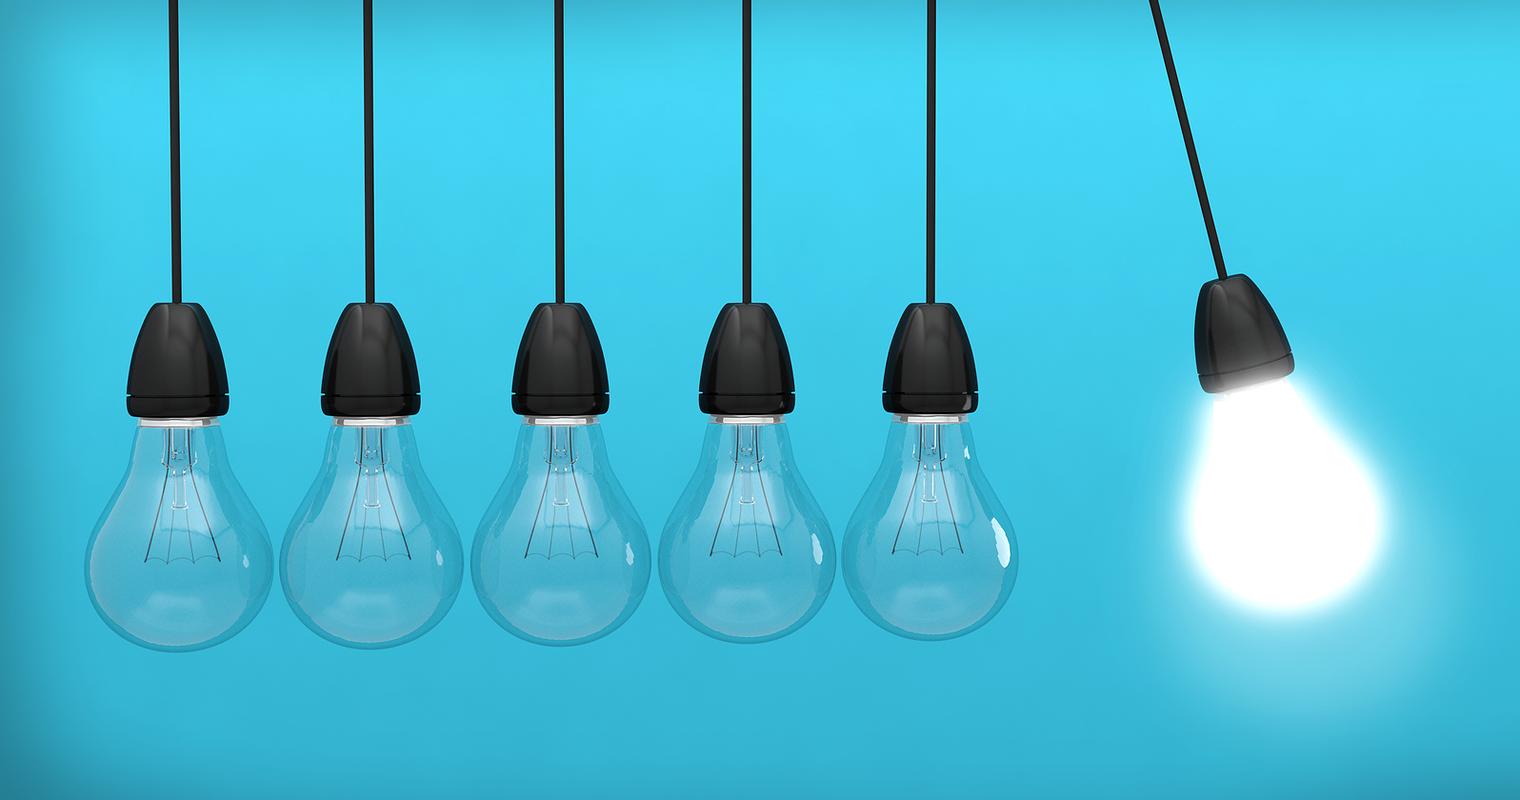 Managing SEO for Non-SEOs: 3 Simple Tips